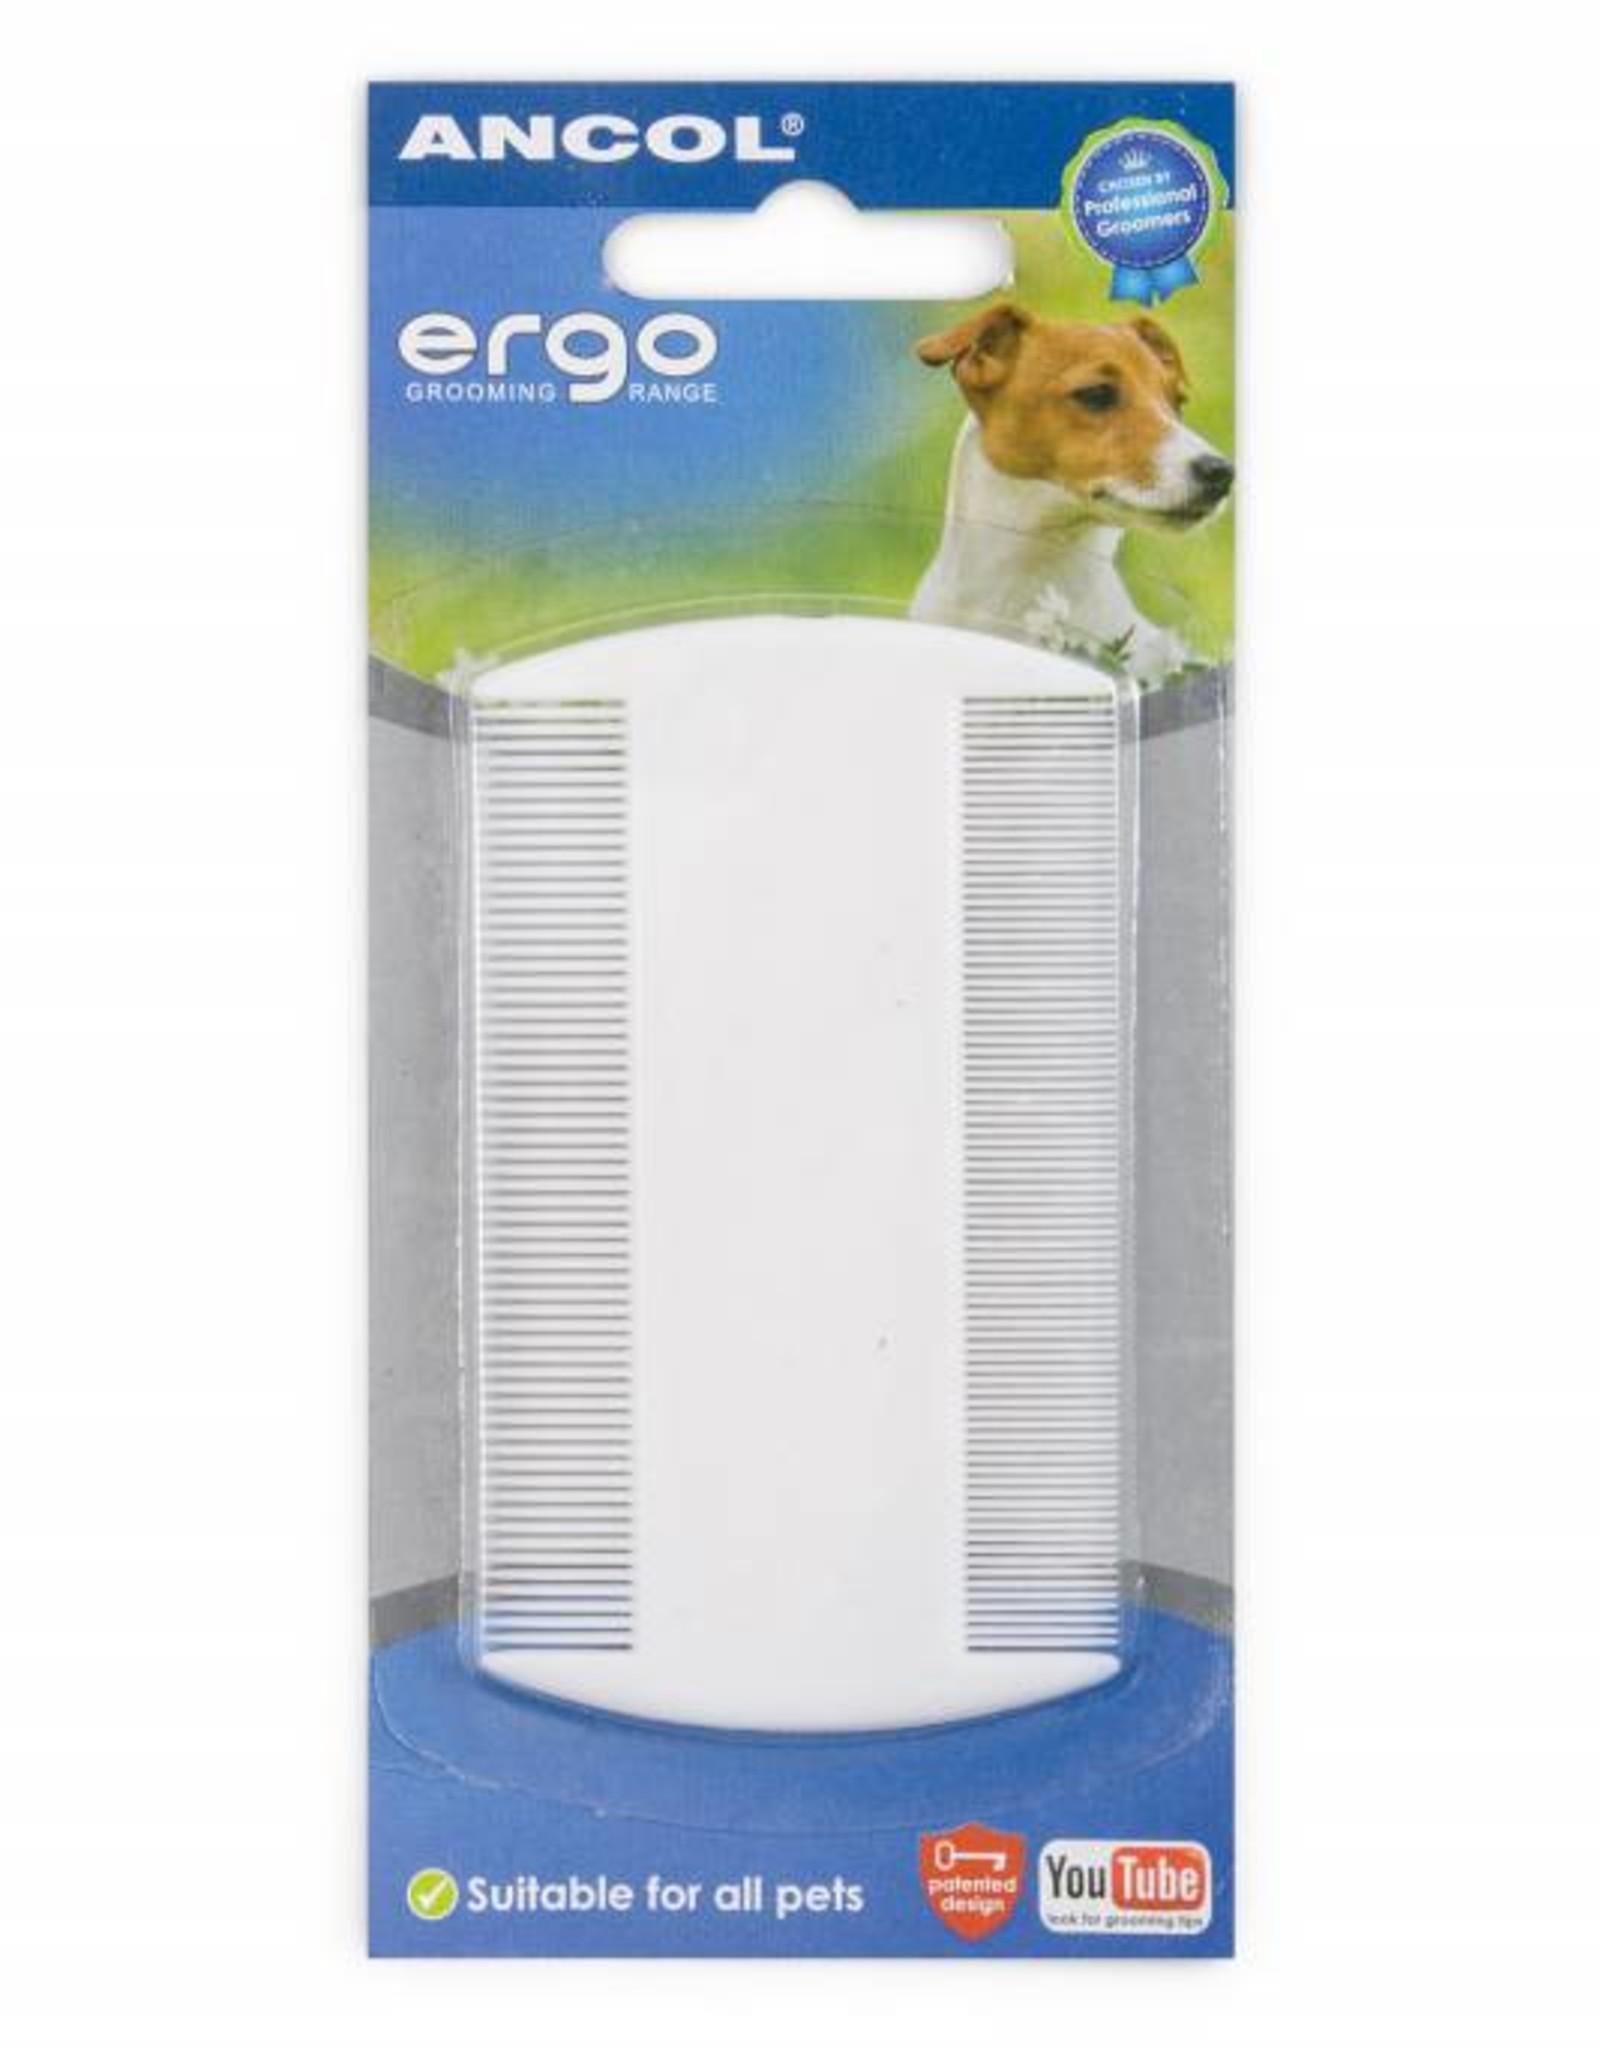 Ancol Ergo Plastic Flea & Nit comb